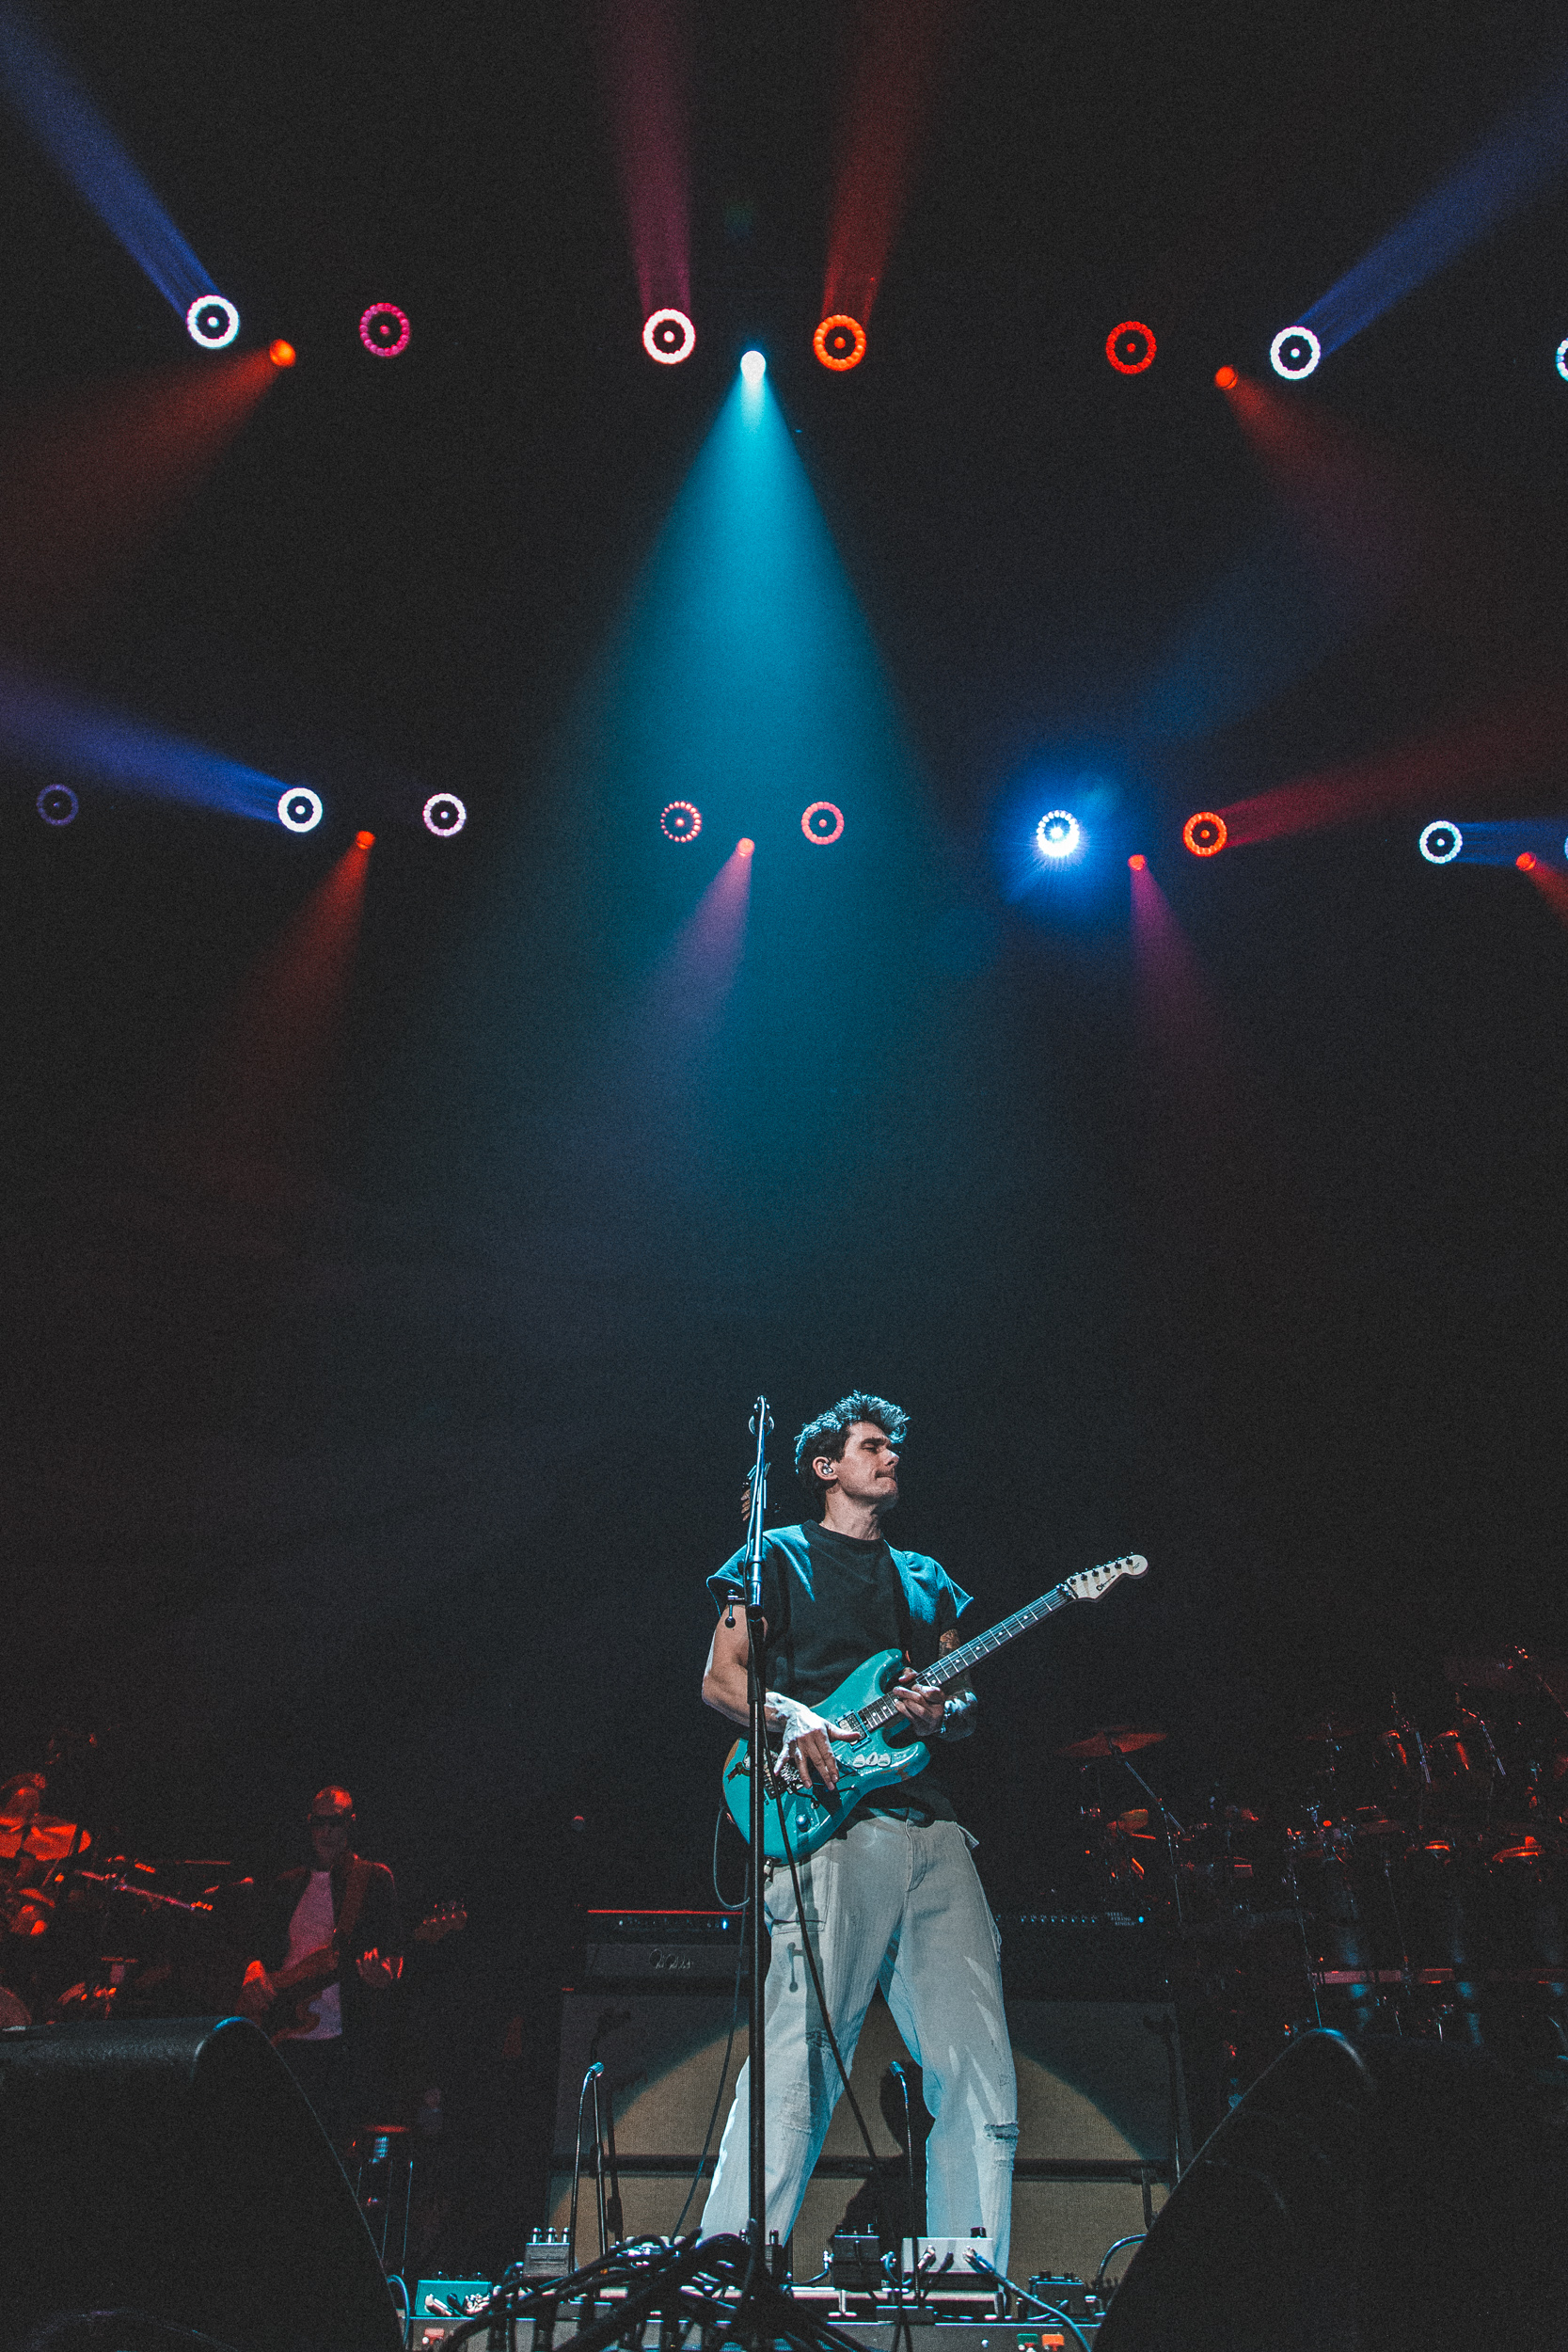 John Mayer-Rod_Laver-1207.jpg